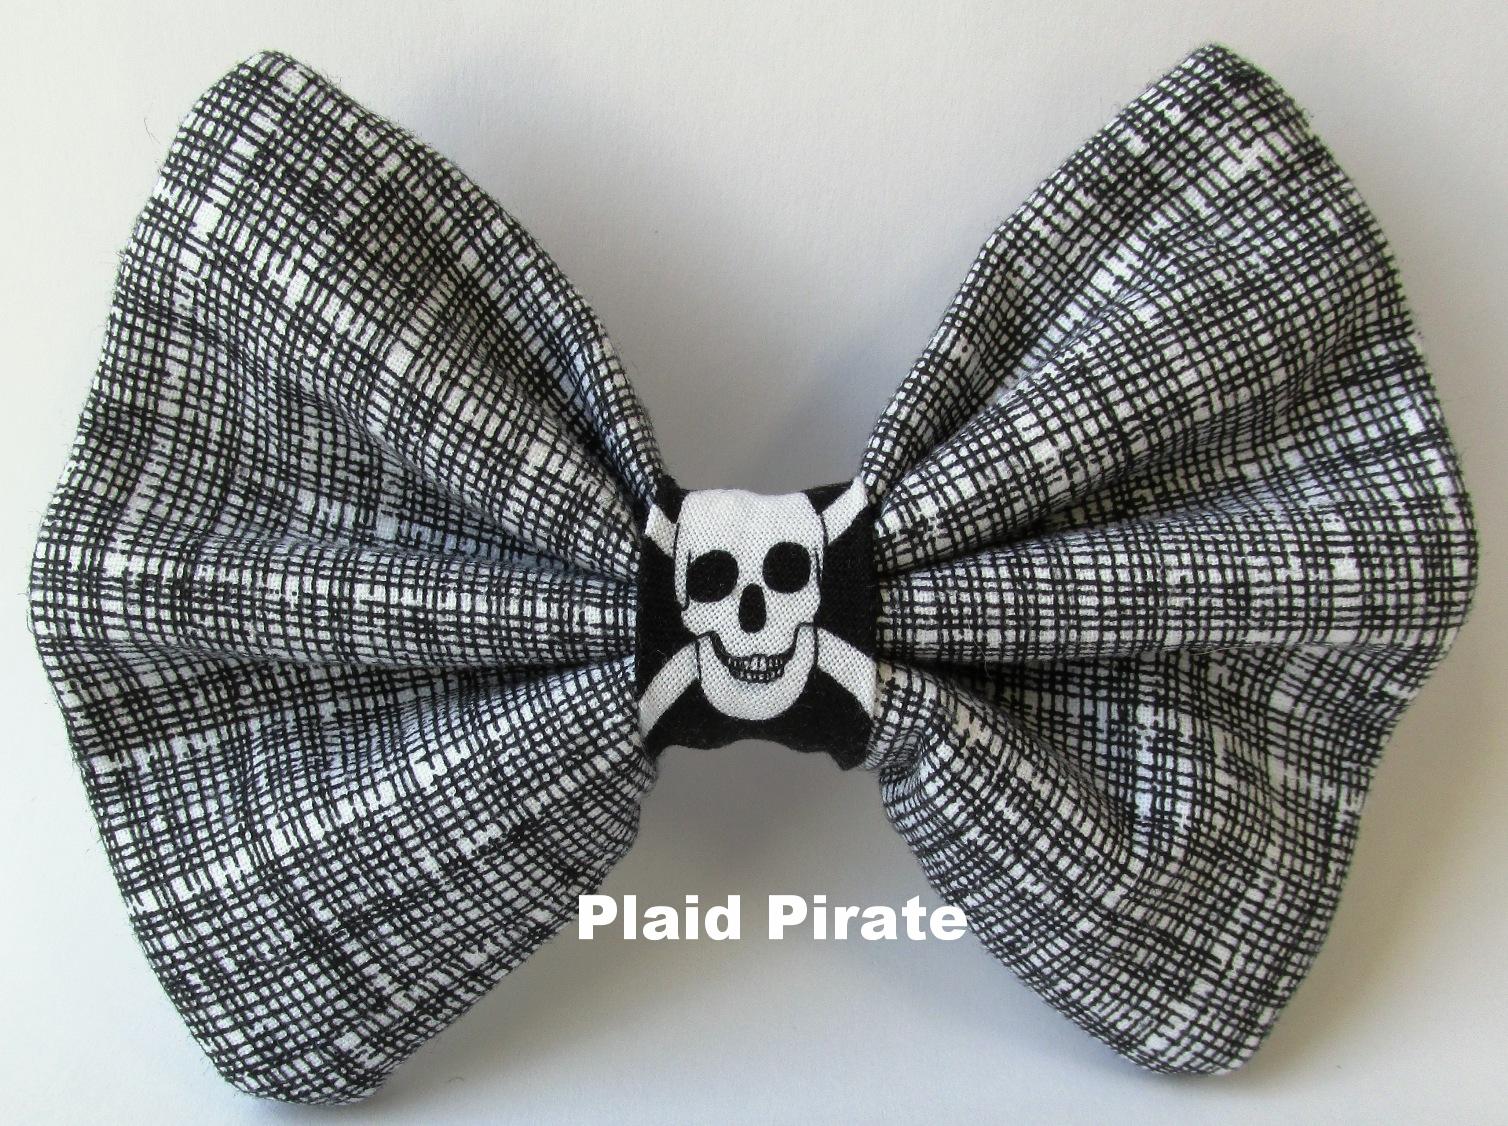 Plaid Pirate 4514 final.jpg